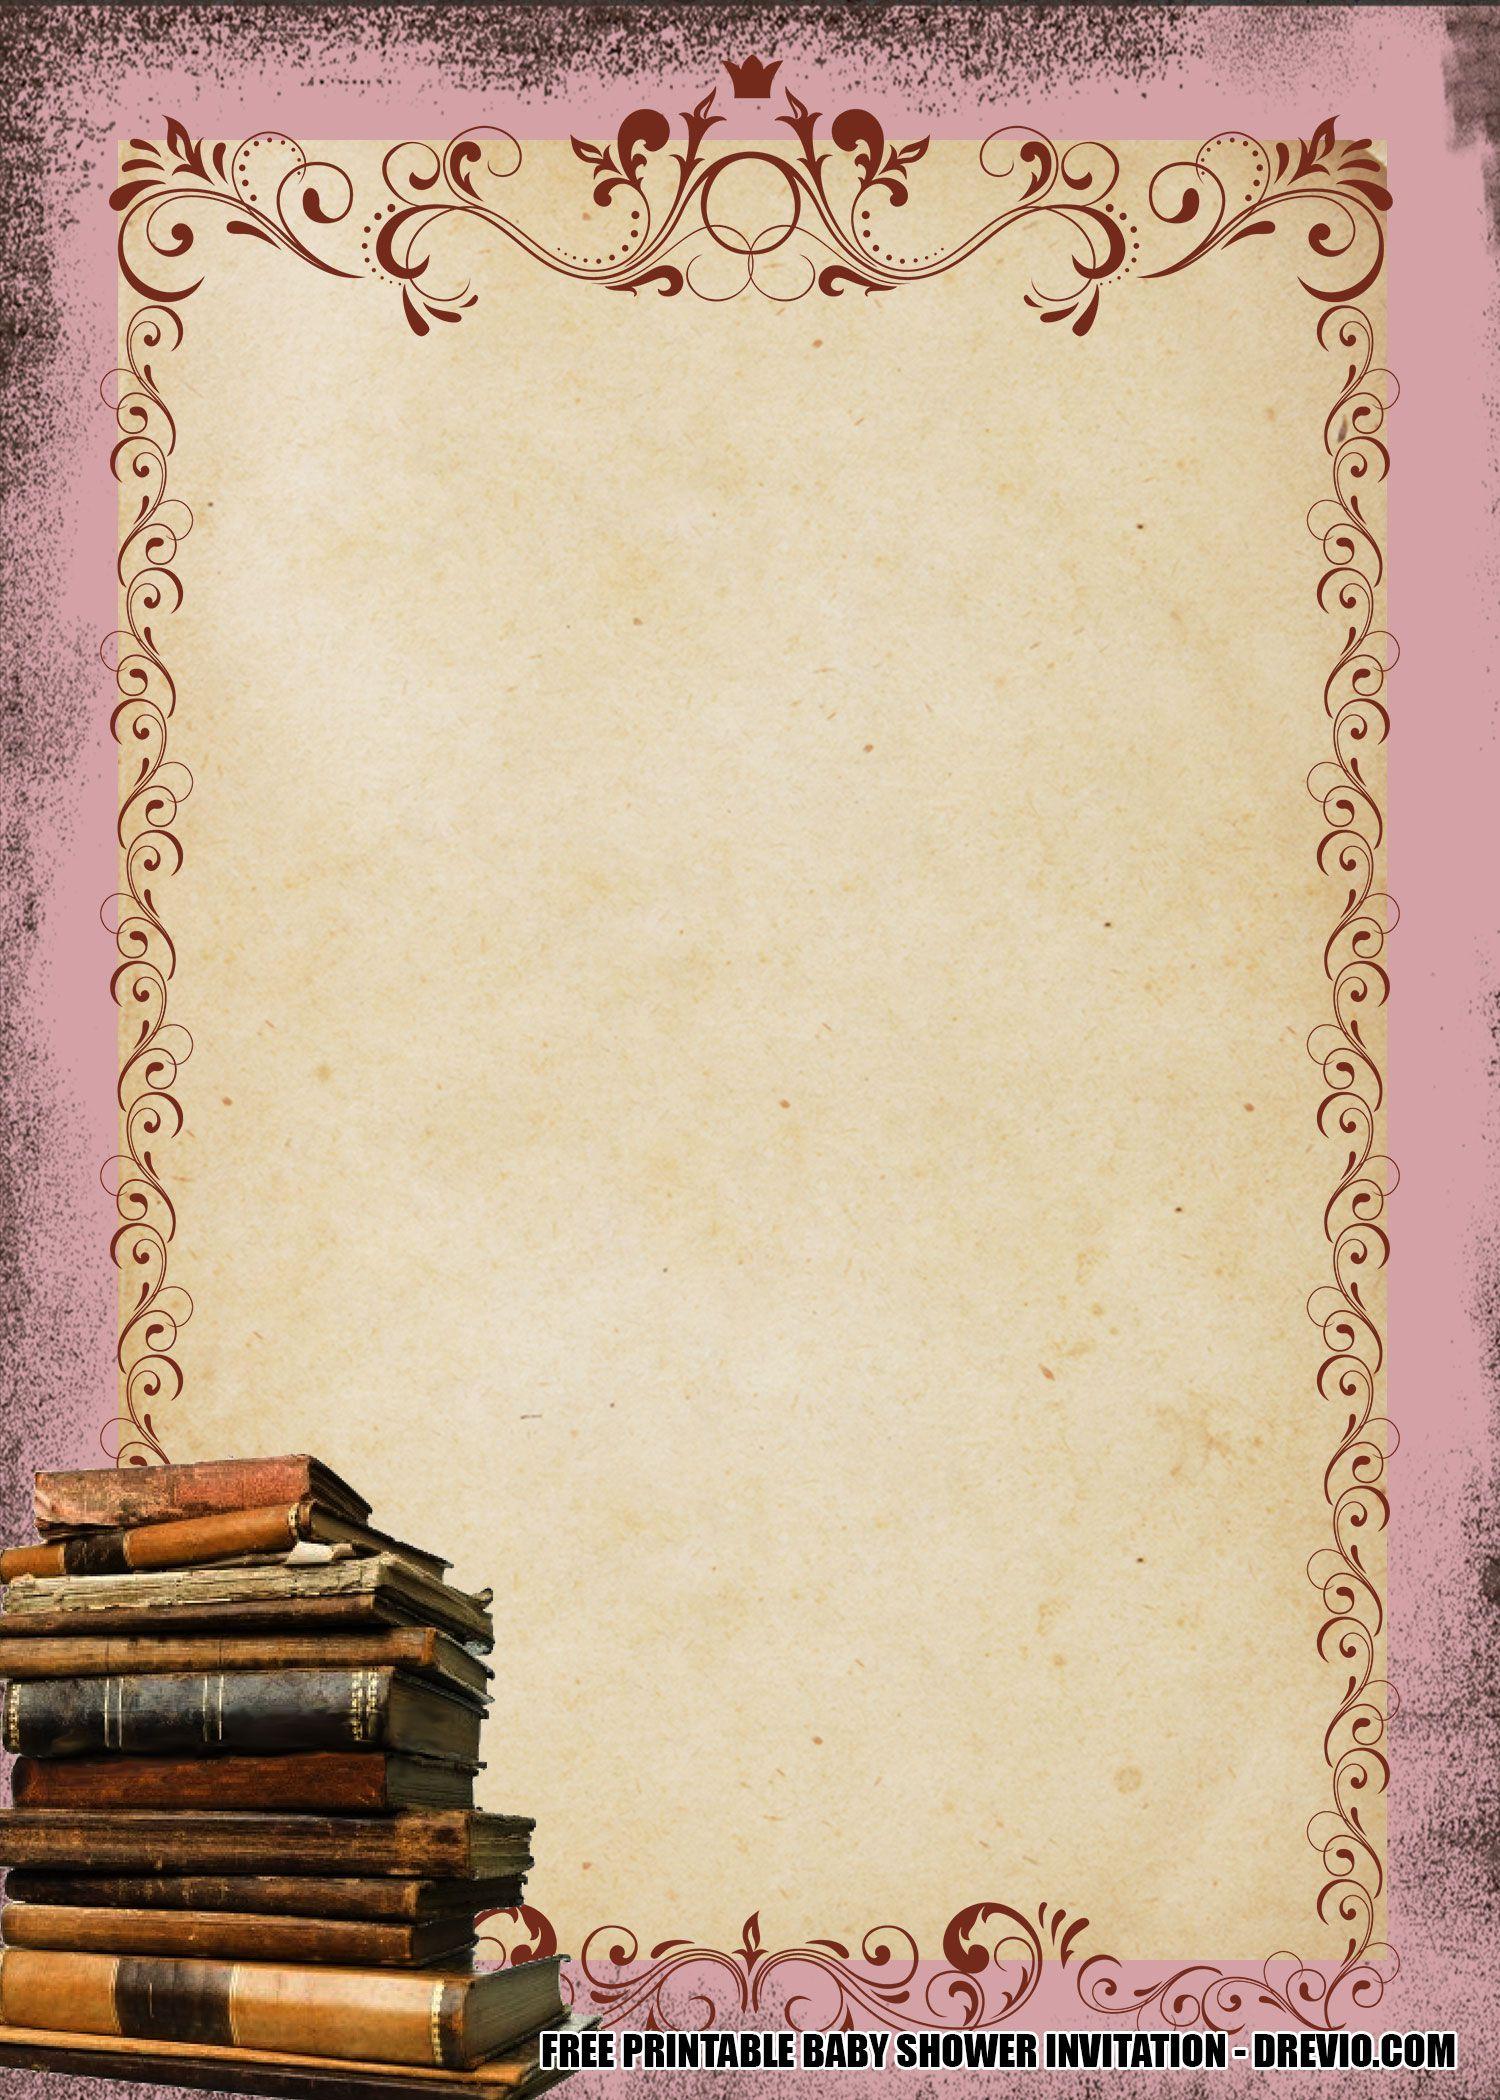 009 Phenomenal Alice In Wonderland Invite Template Image  Party Invitation FreeFull